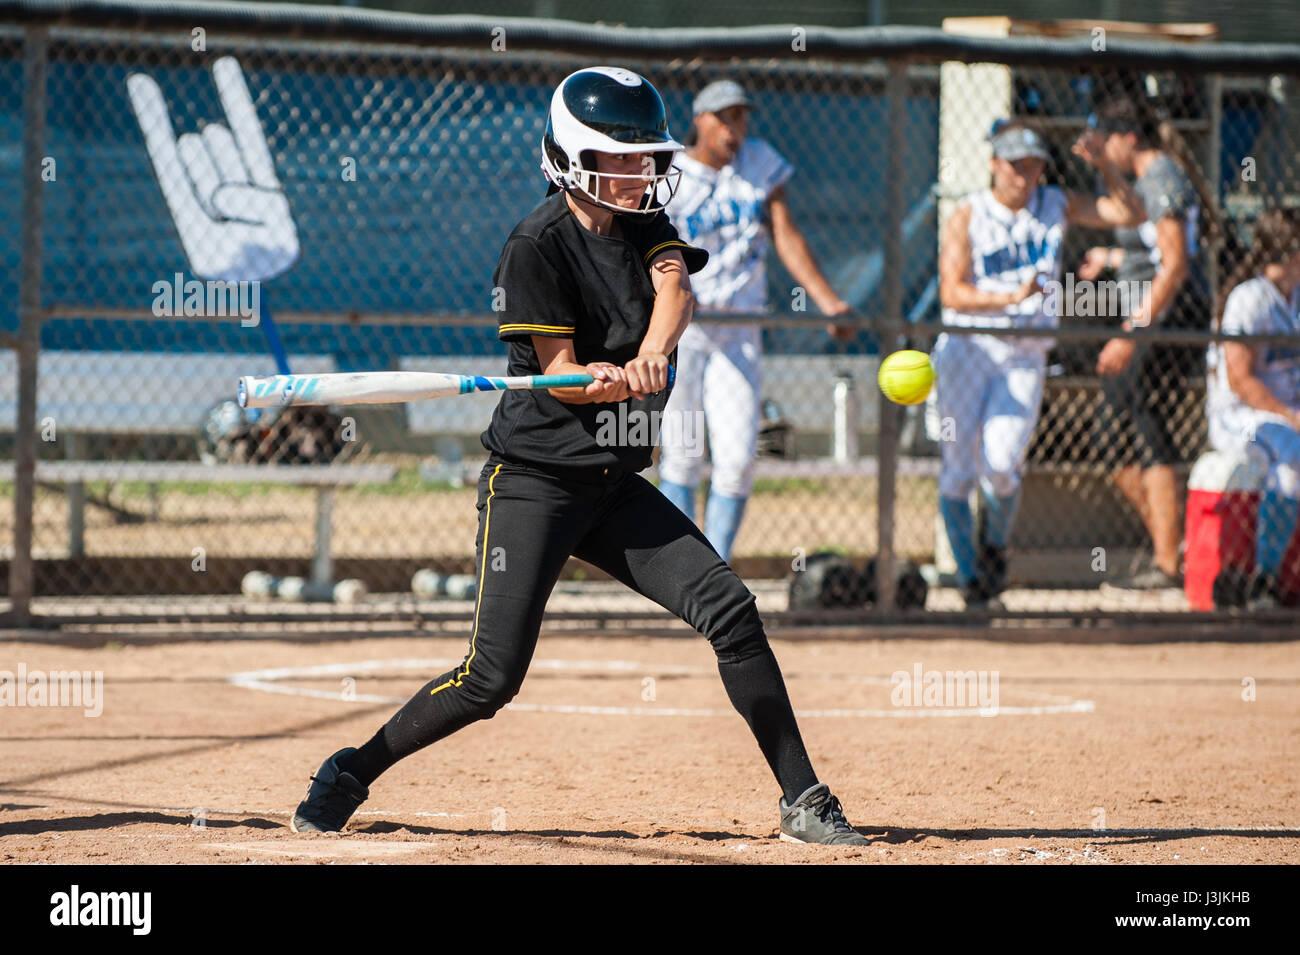 Fast Pitch Softball Stockfotos & Fast Pitch Softball Bilder - Alamy